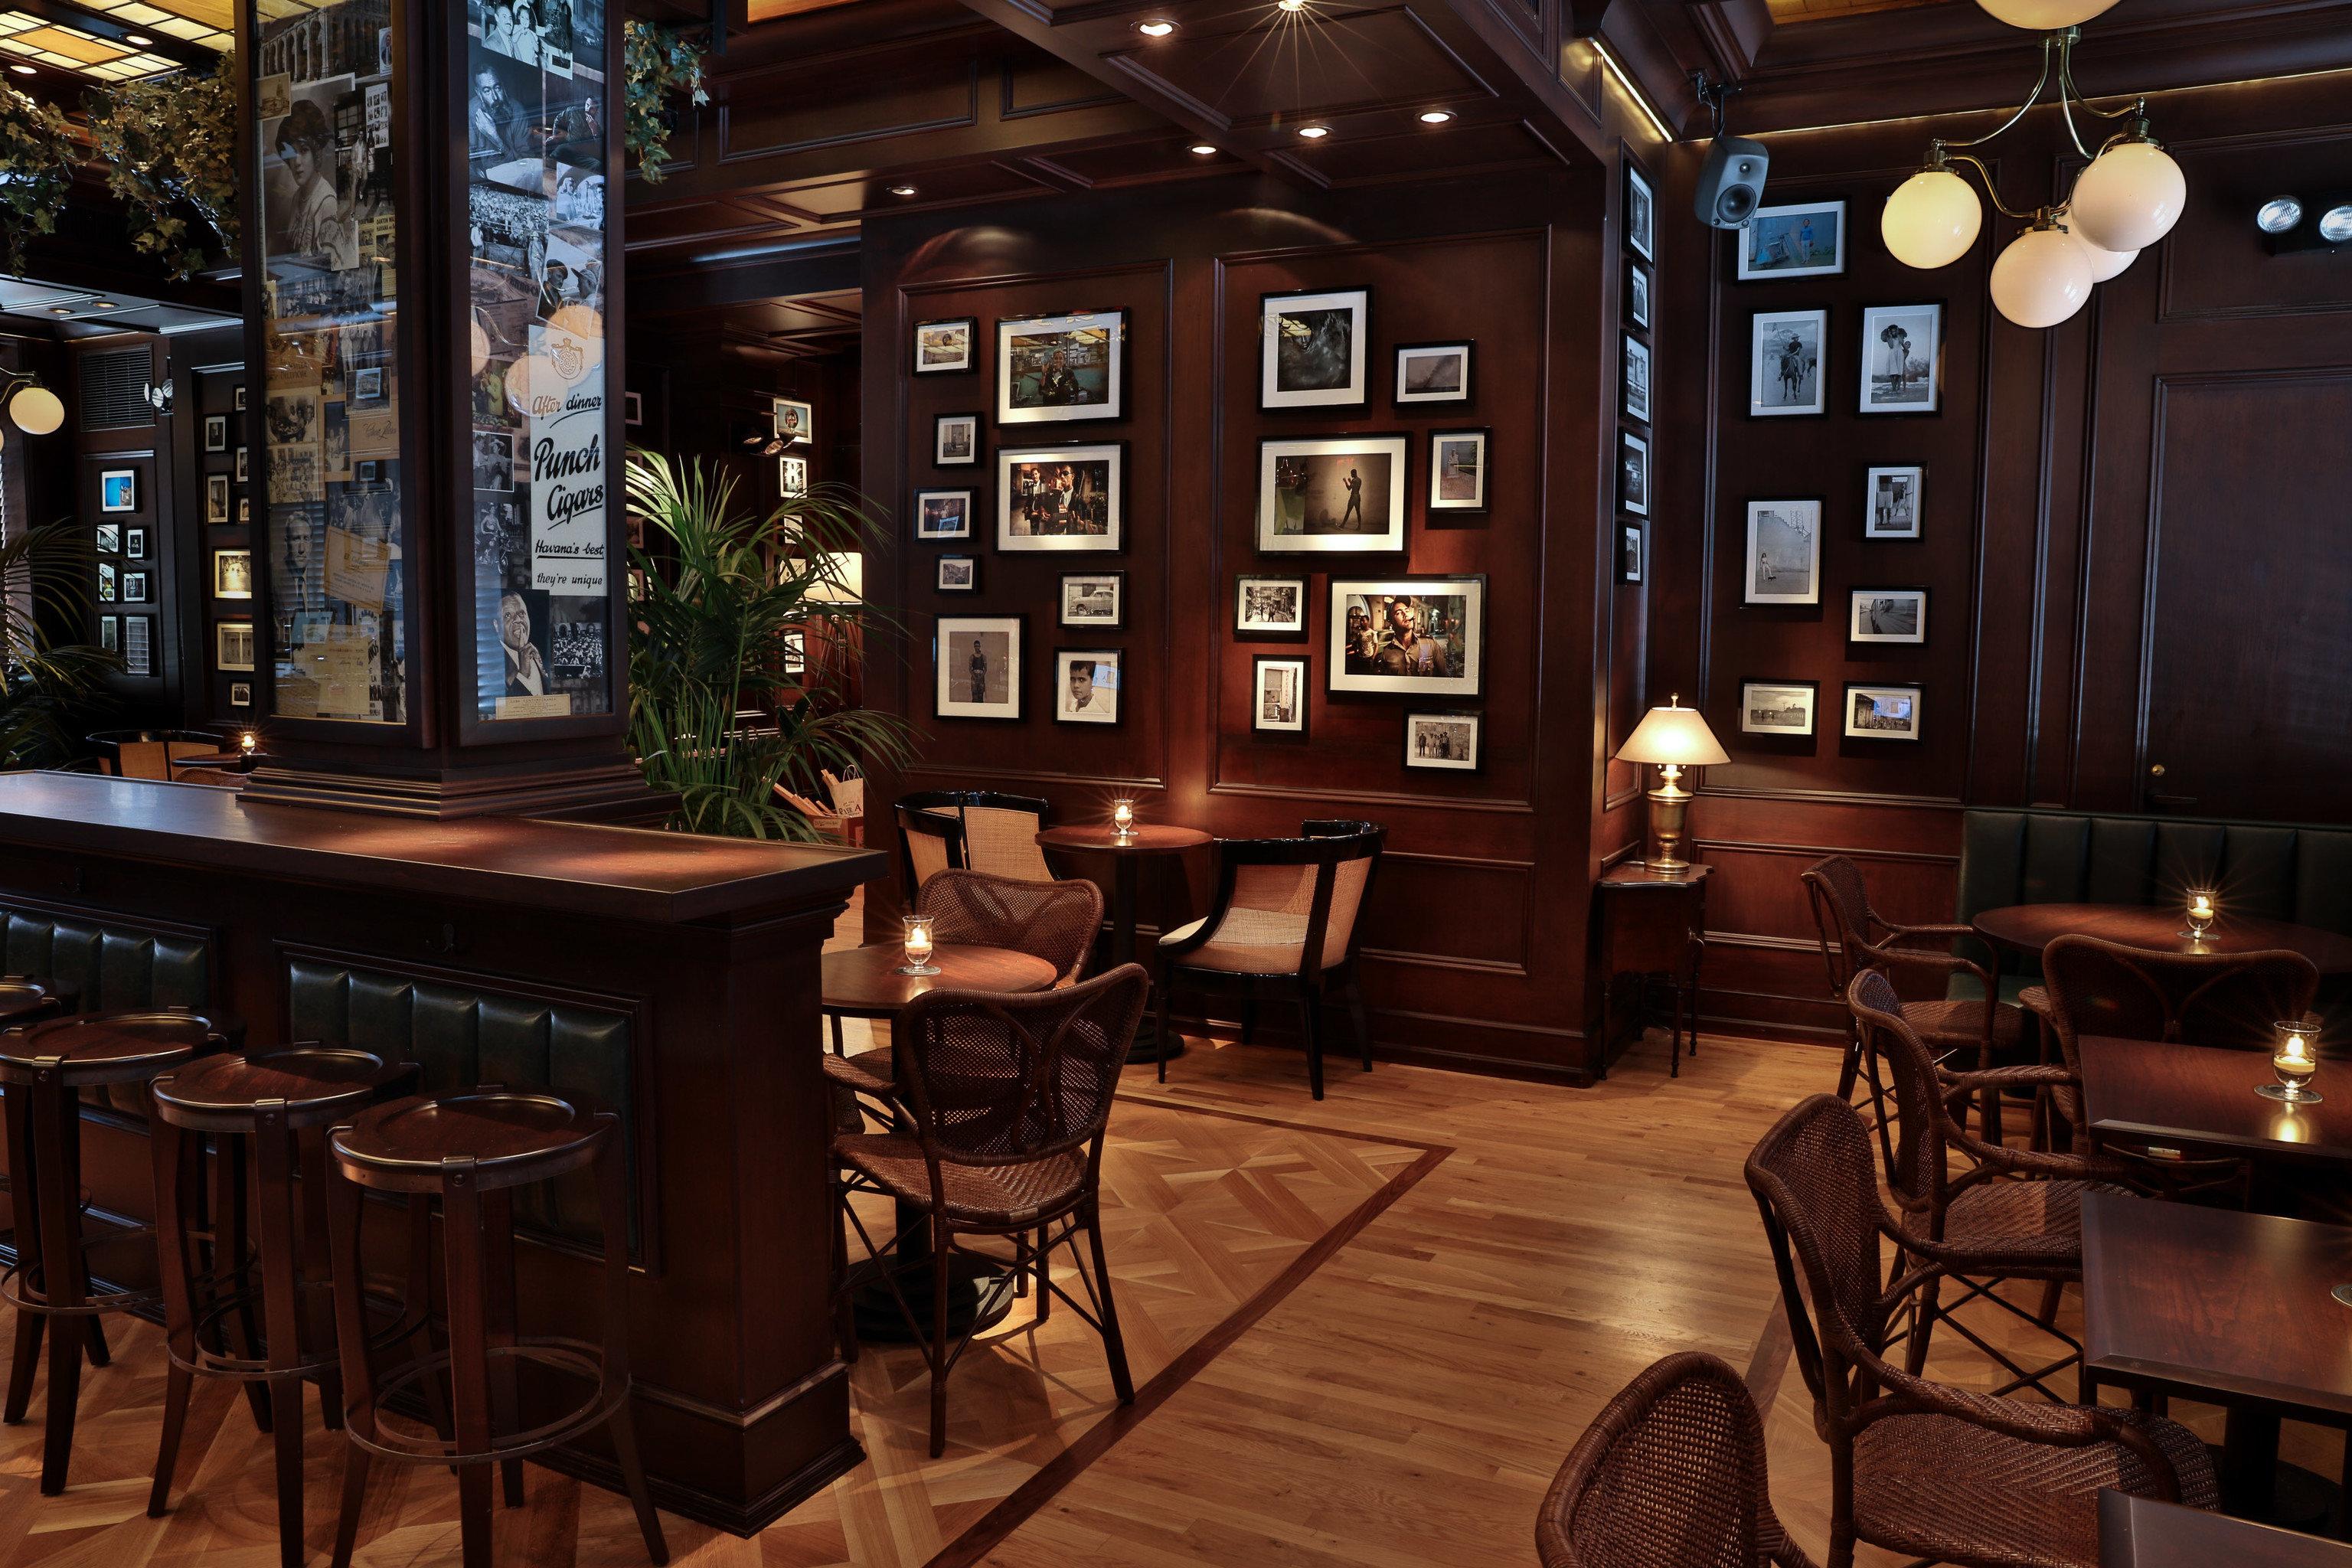 Food + Drink floor indoor chair Bar café restaurant interior design estate recreation room tavern coffeehouse furniture dining table dining room